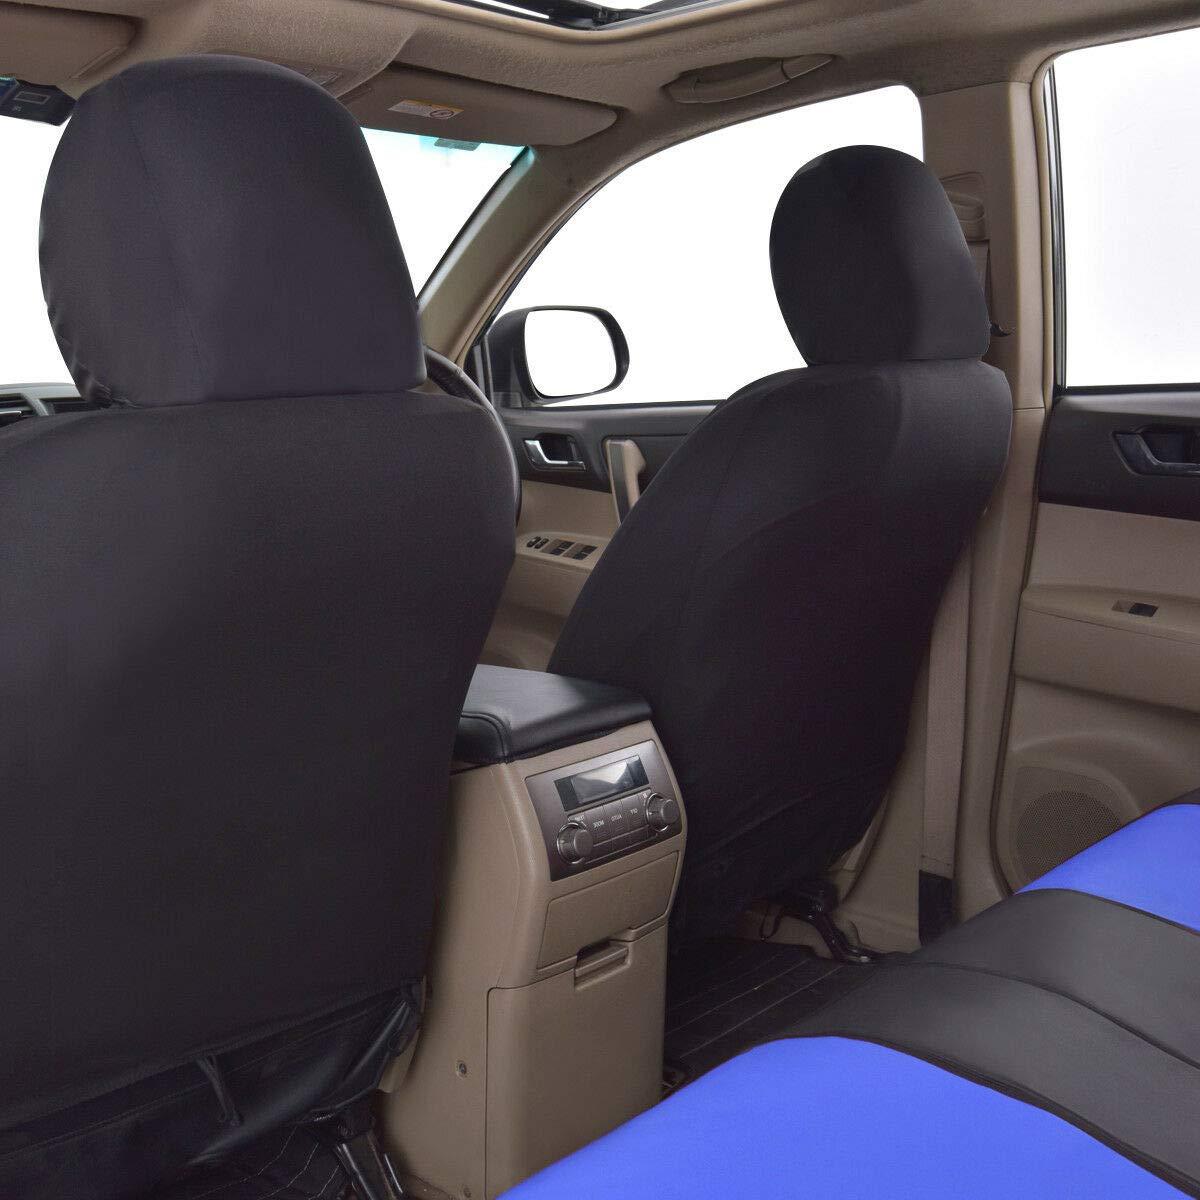 Flying banner coprisedili universali design in pelle PU con airbag laterale